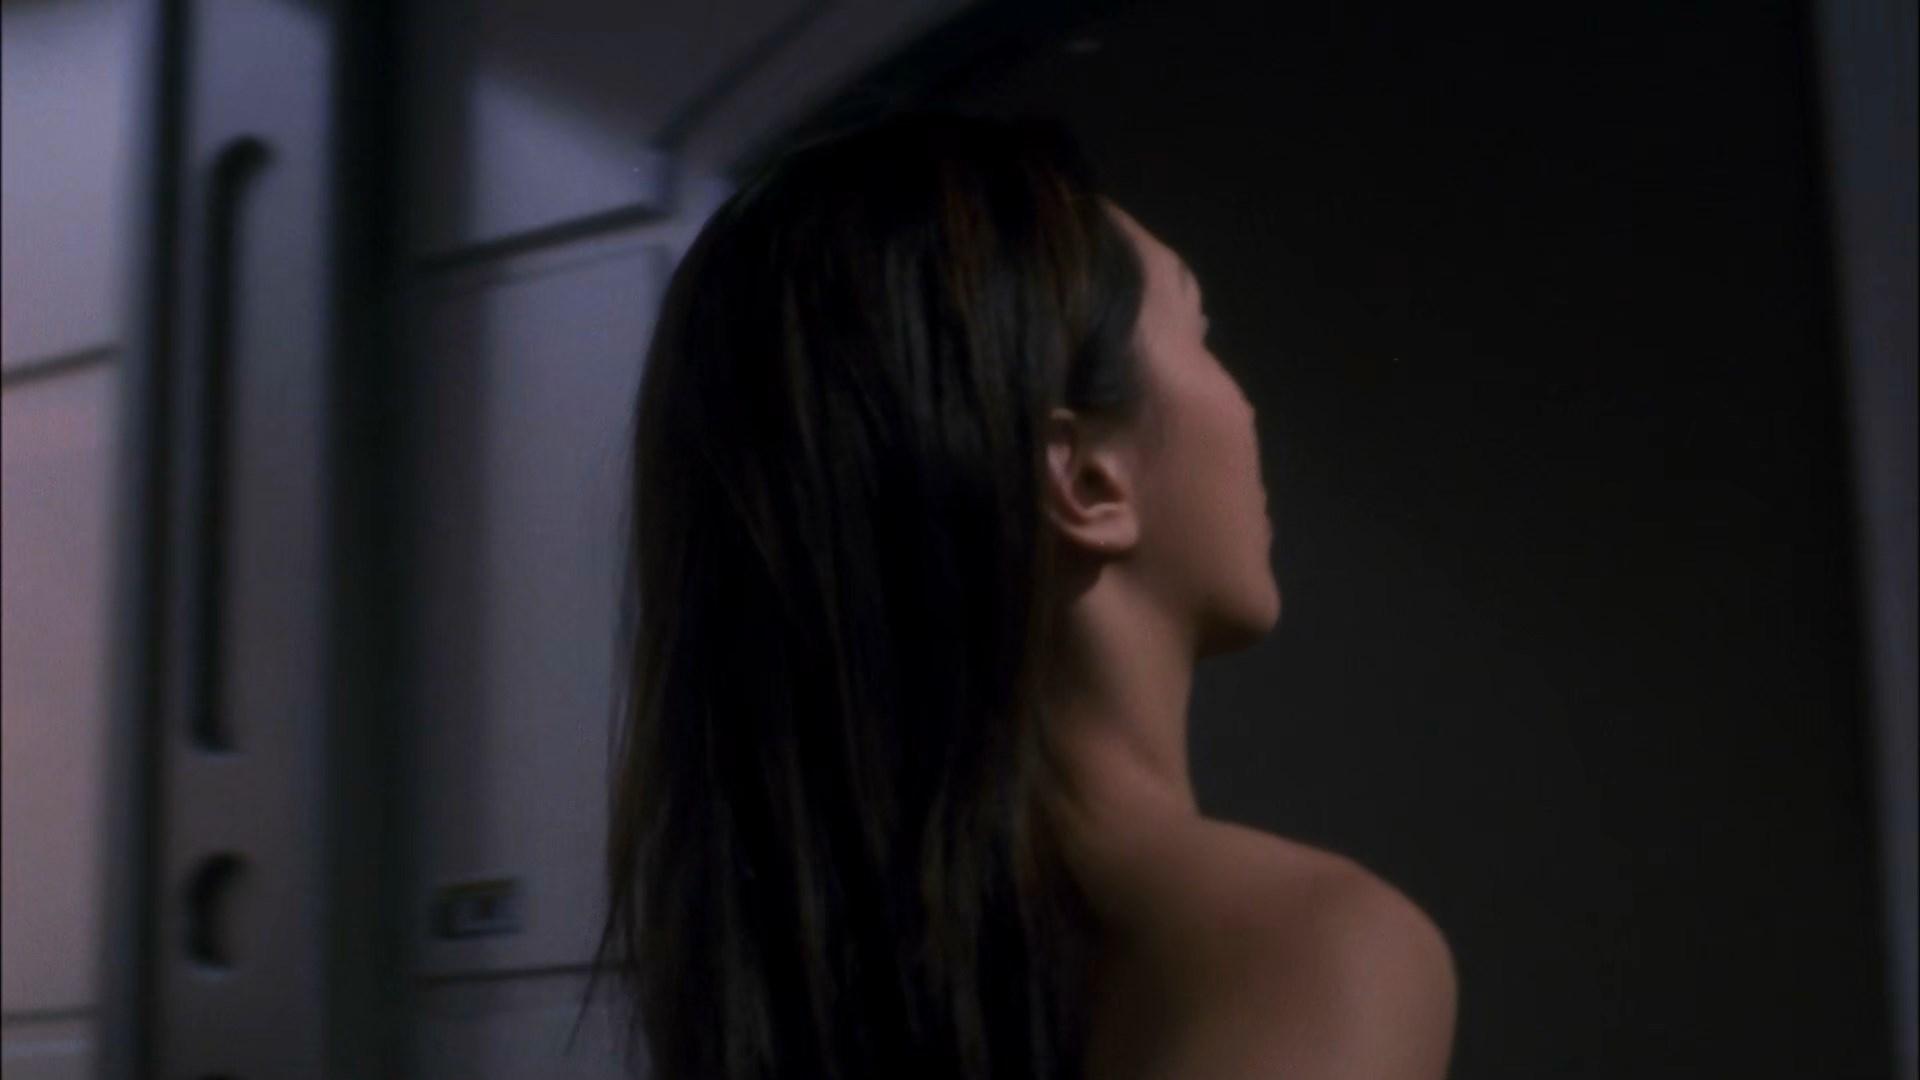 Big tit porn stars creampie